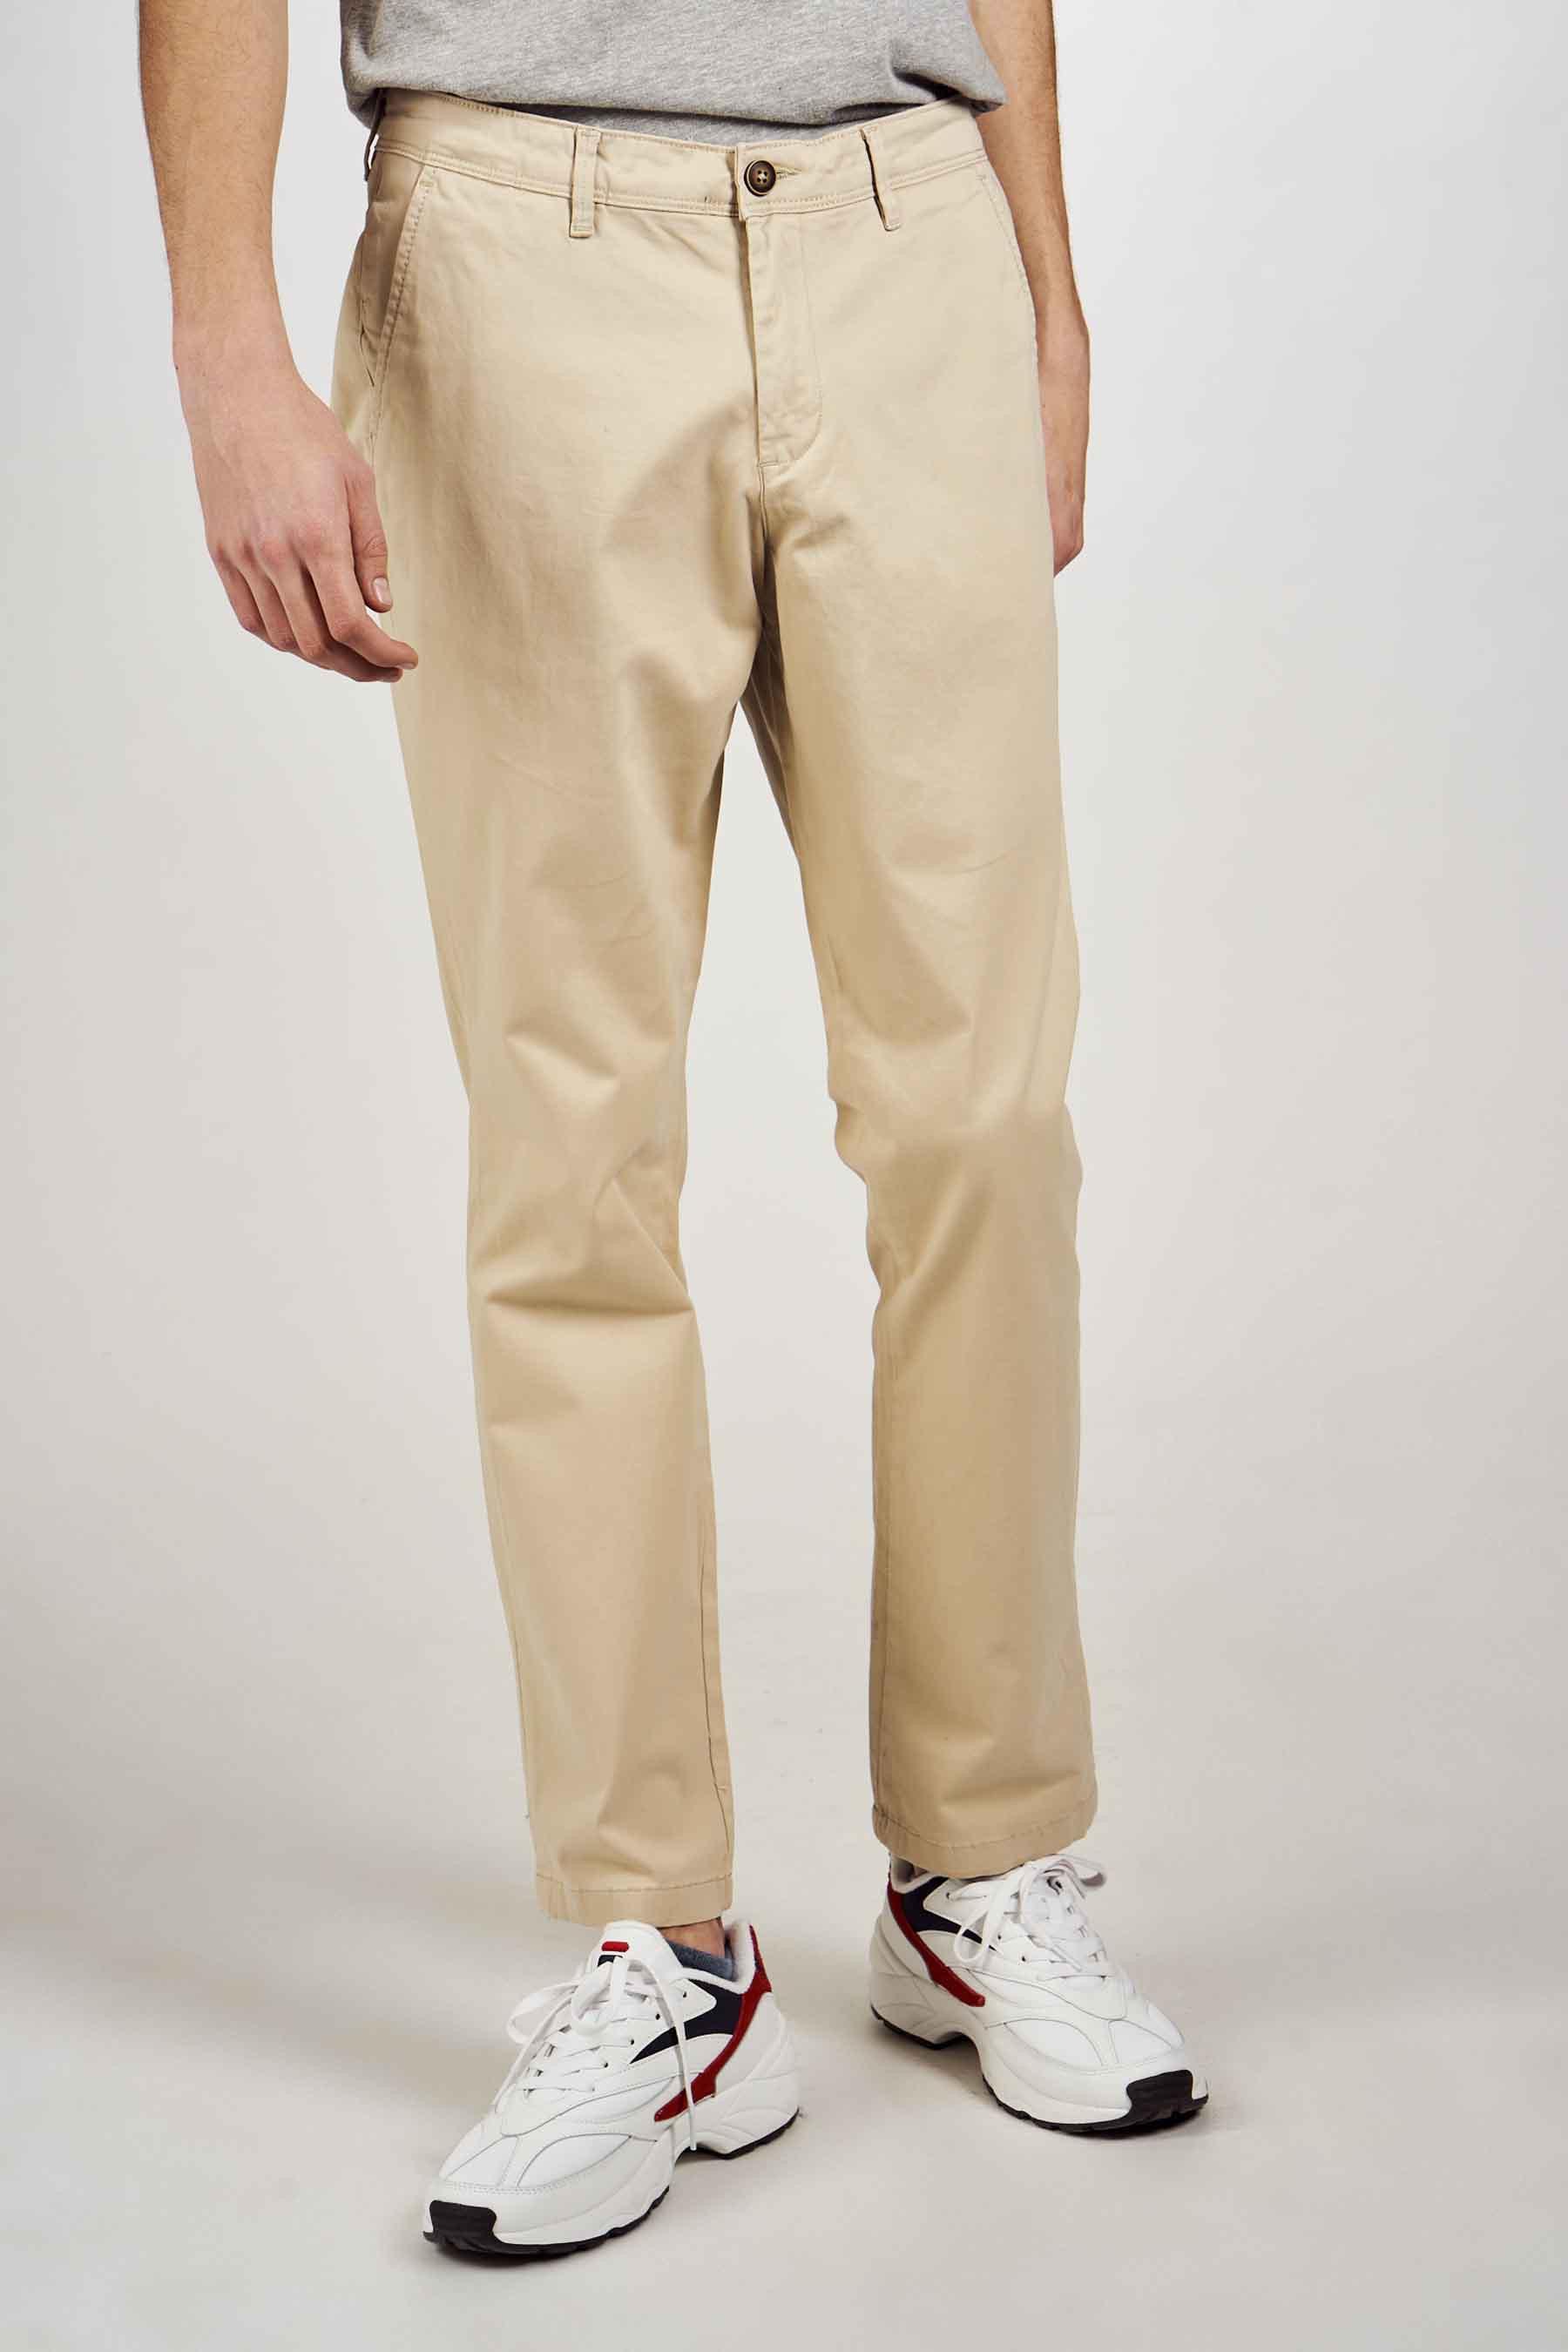 Jack & Jones Jeans Intelligenc Chino, Wit, Heren, Maat: 28x32/29x32/29x34/30x32/